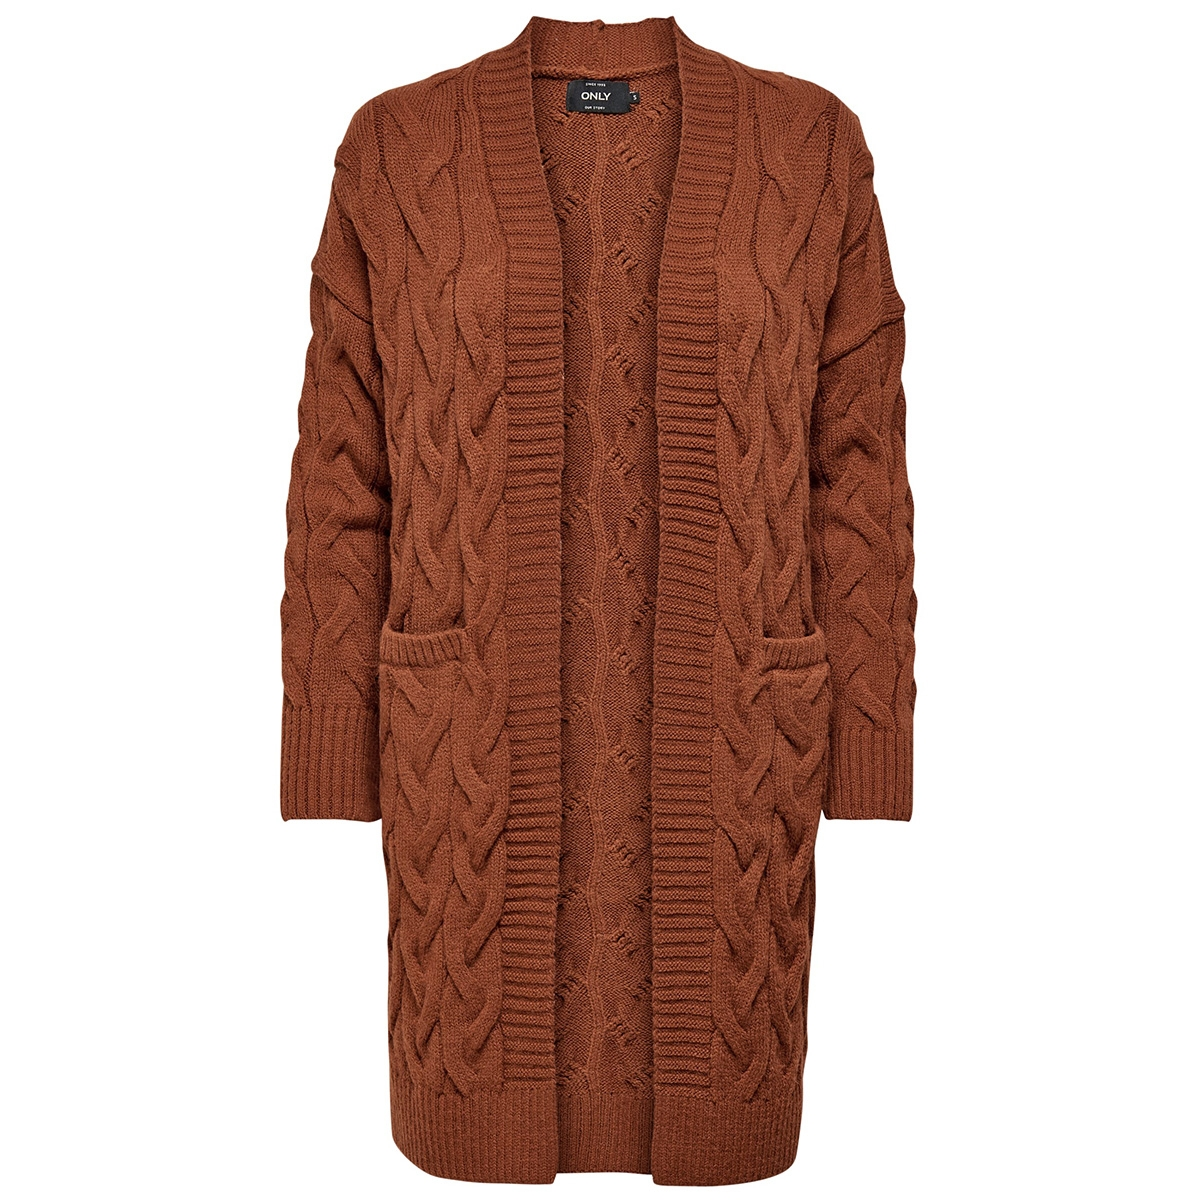 onlfreyah l/s cardigan knt 15183912 only vest ginger bread